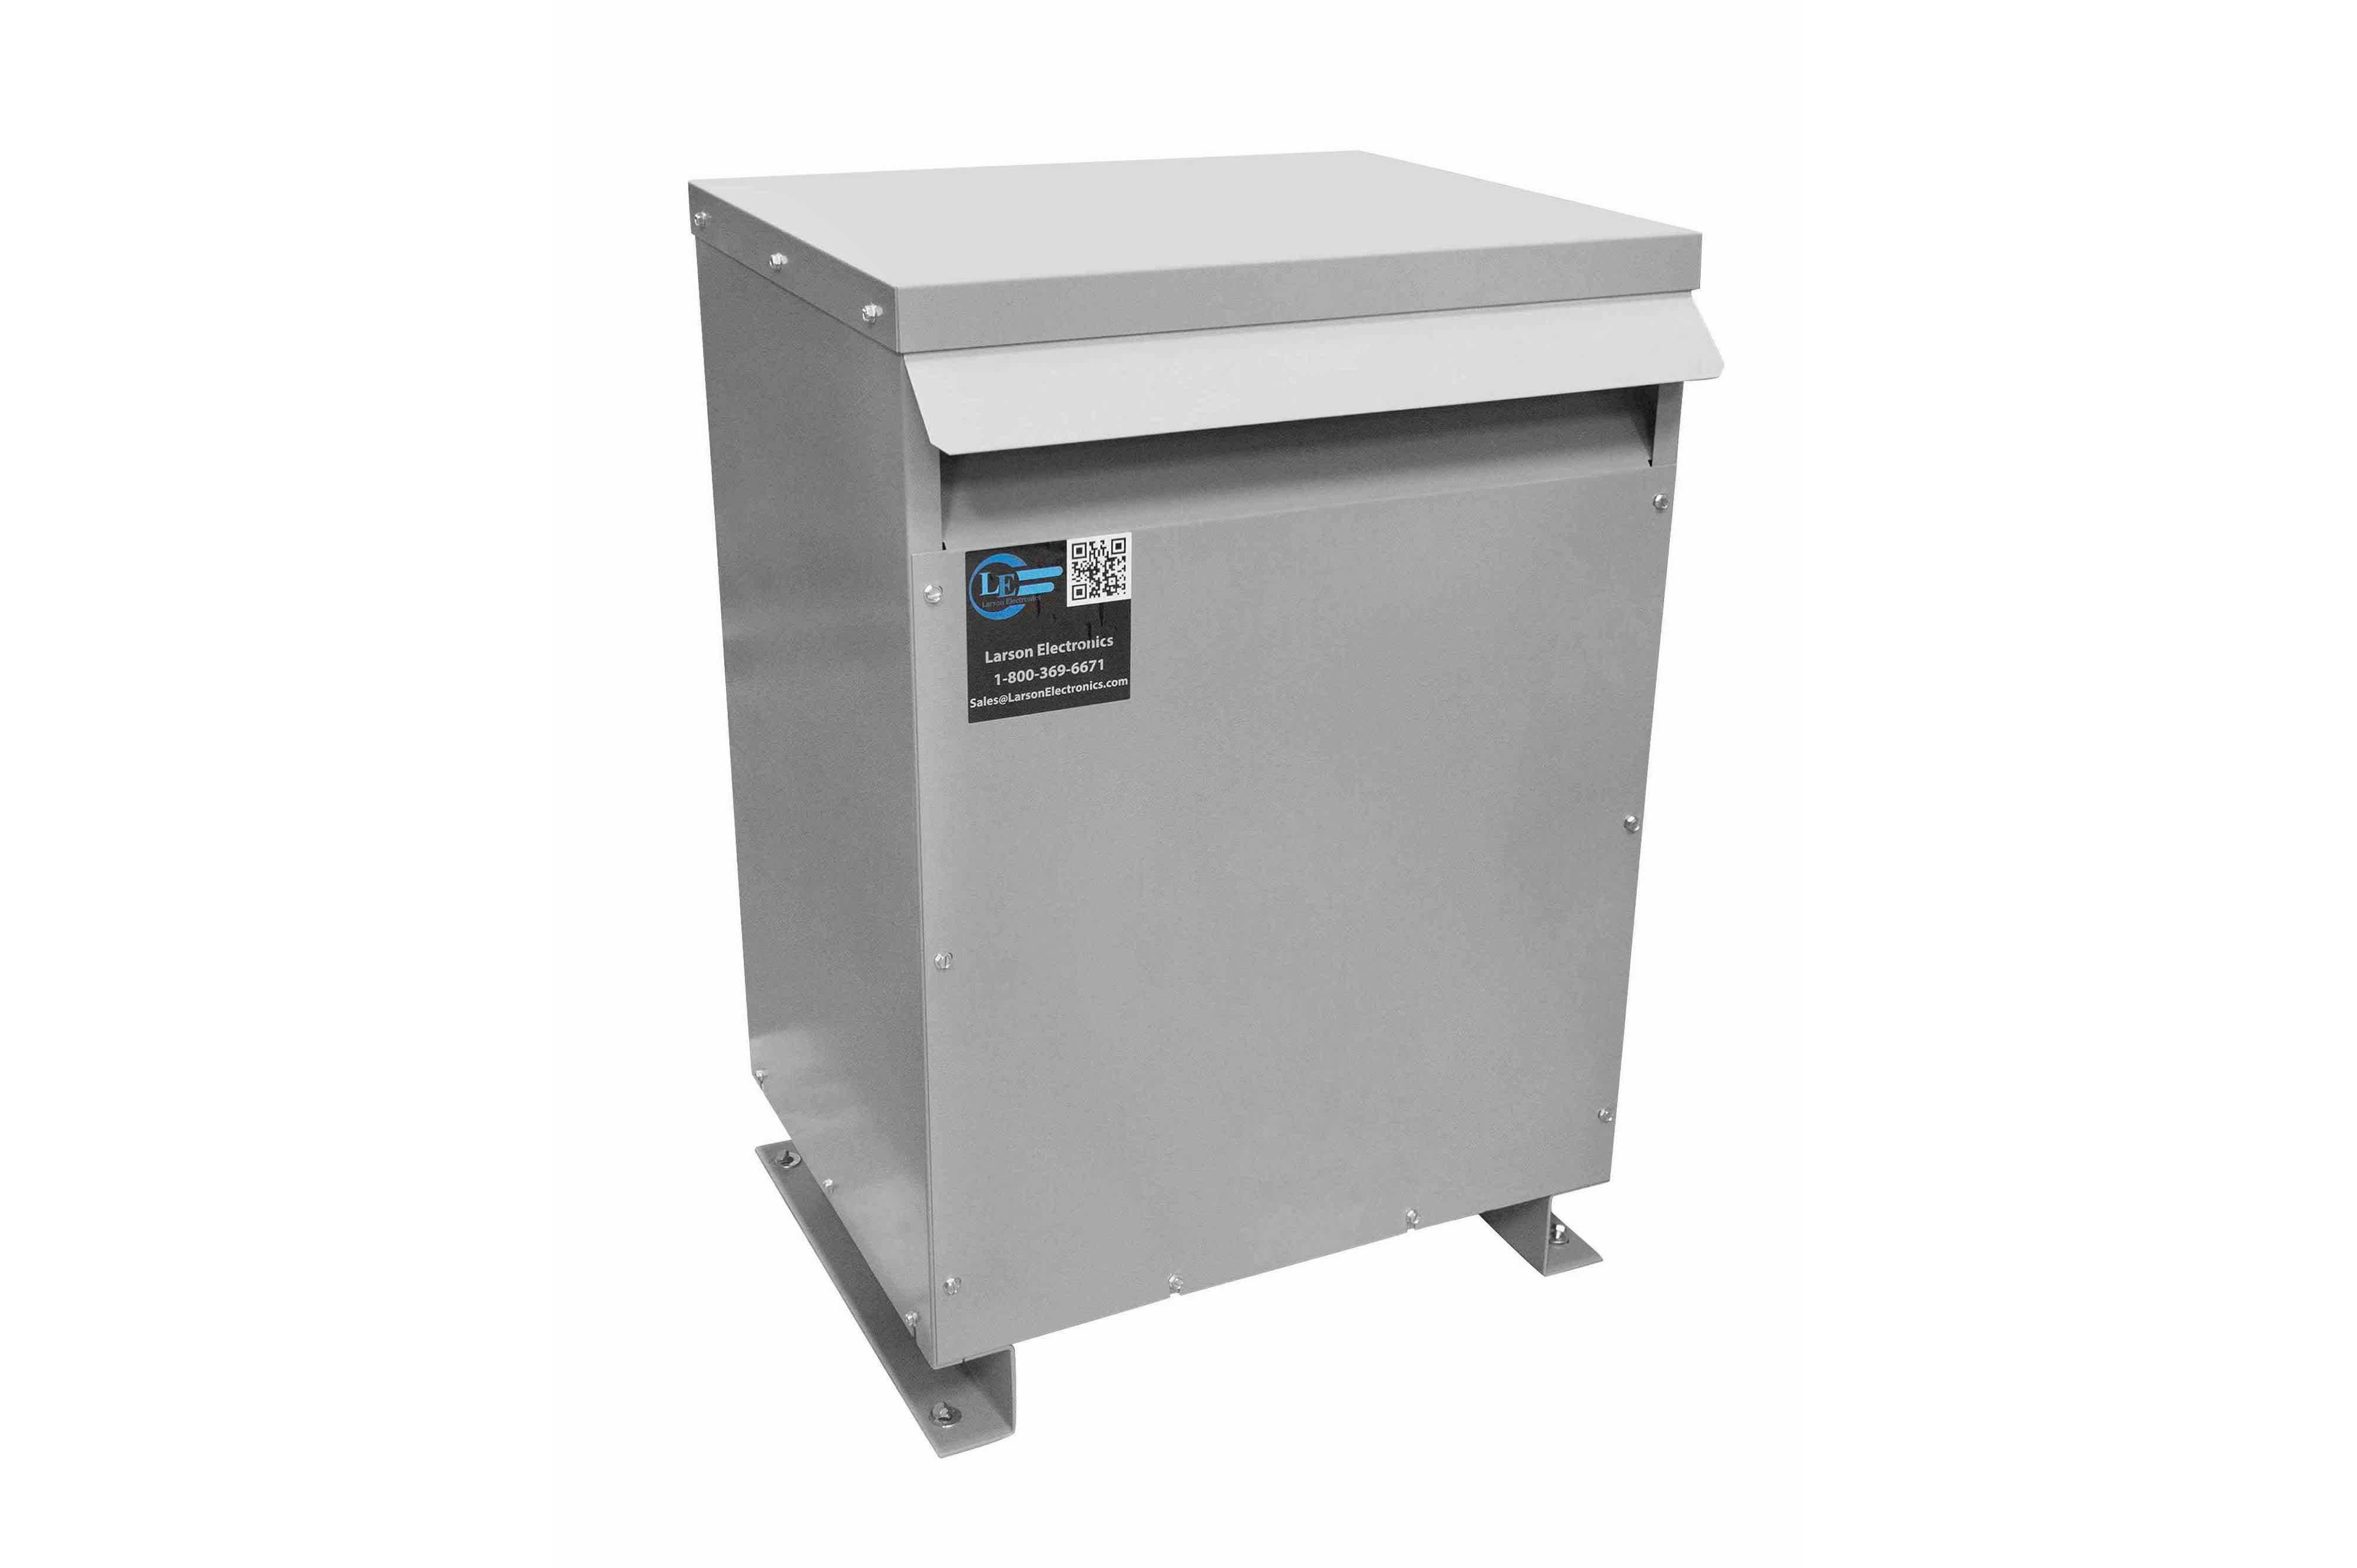 200 kVA 3PH Isolation Transformer, 575V Wye Primary, 380Y/220 Wye-N Secondary, N3R, Ventilated, 60 Hz